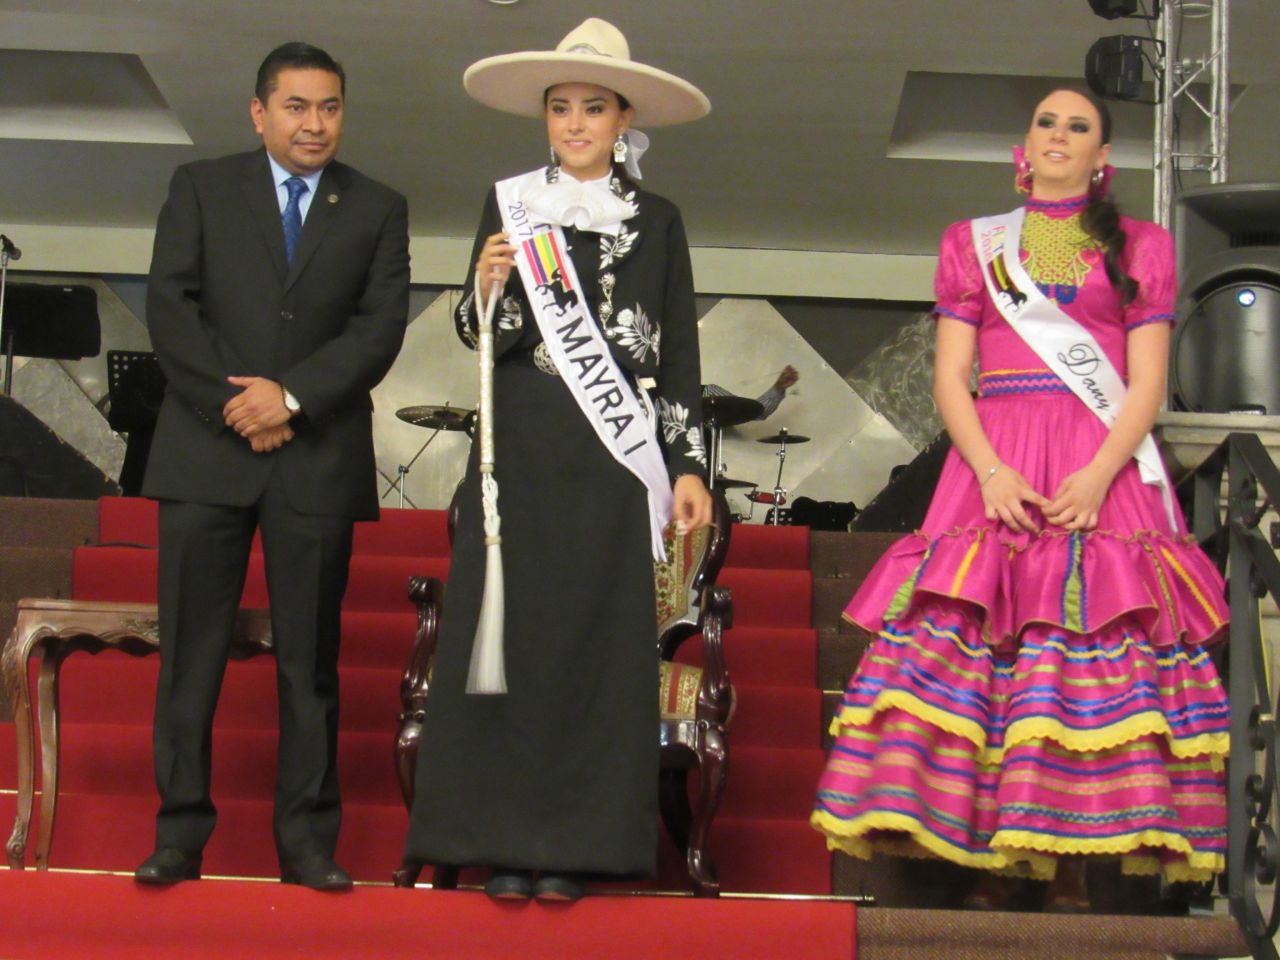 Coronan a Mayra l como reina de la Feria Internacional del Caballo Texcoco 2017